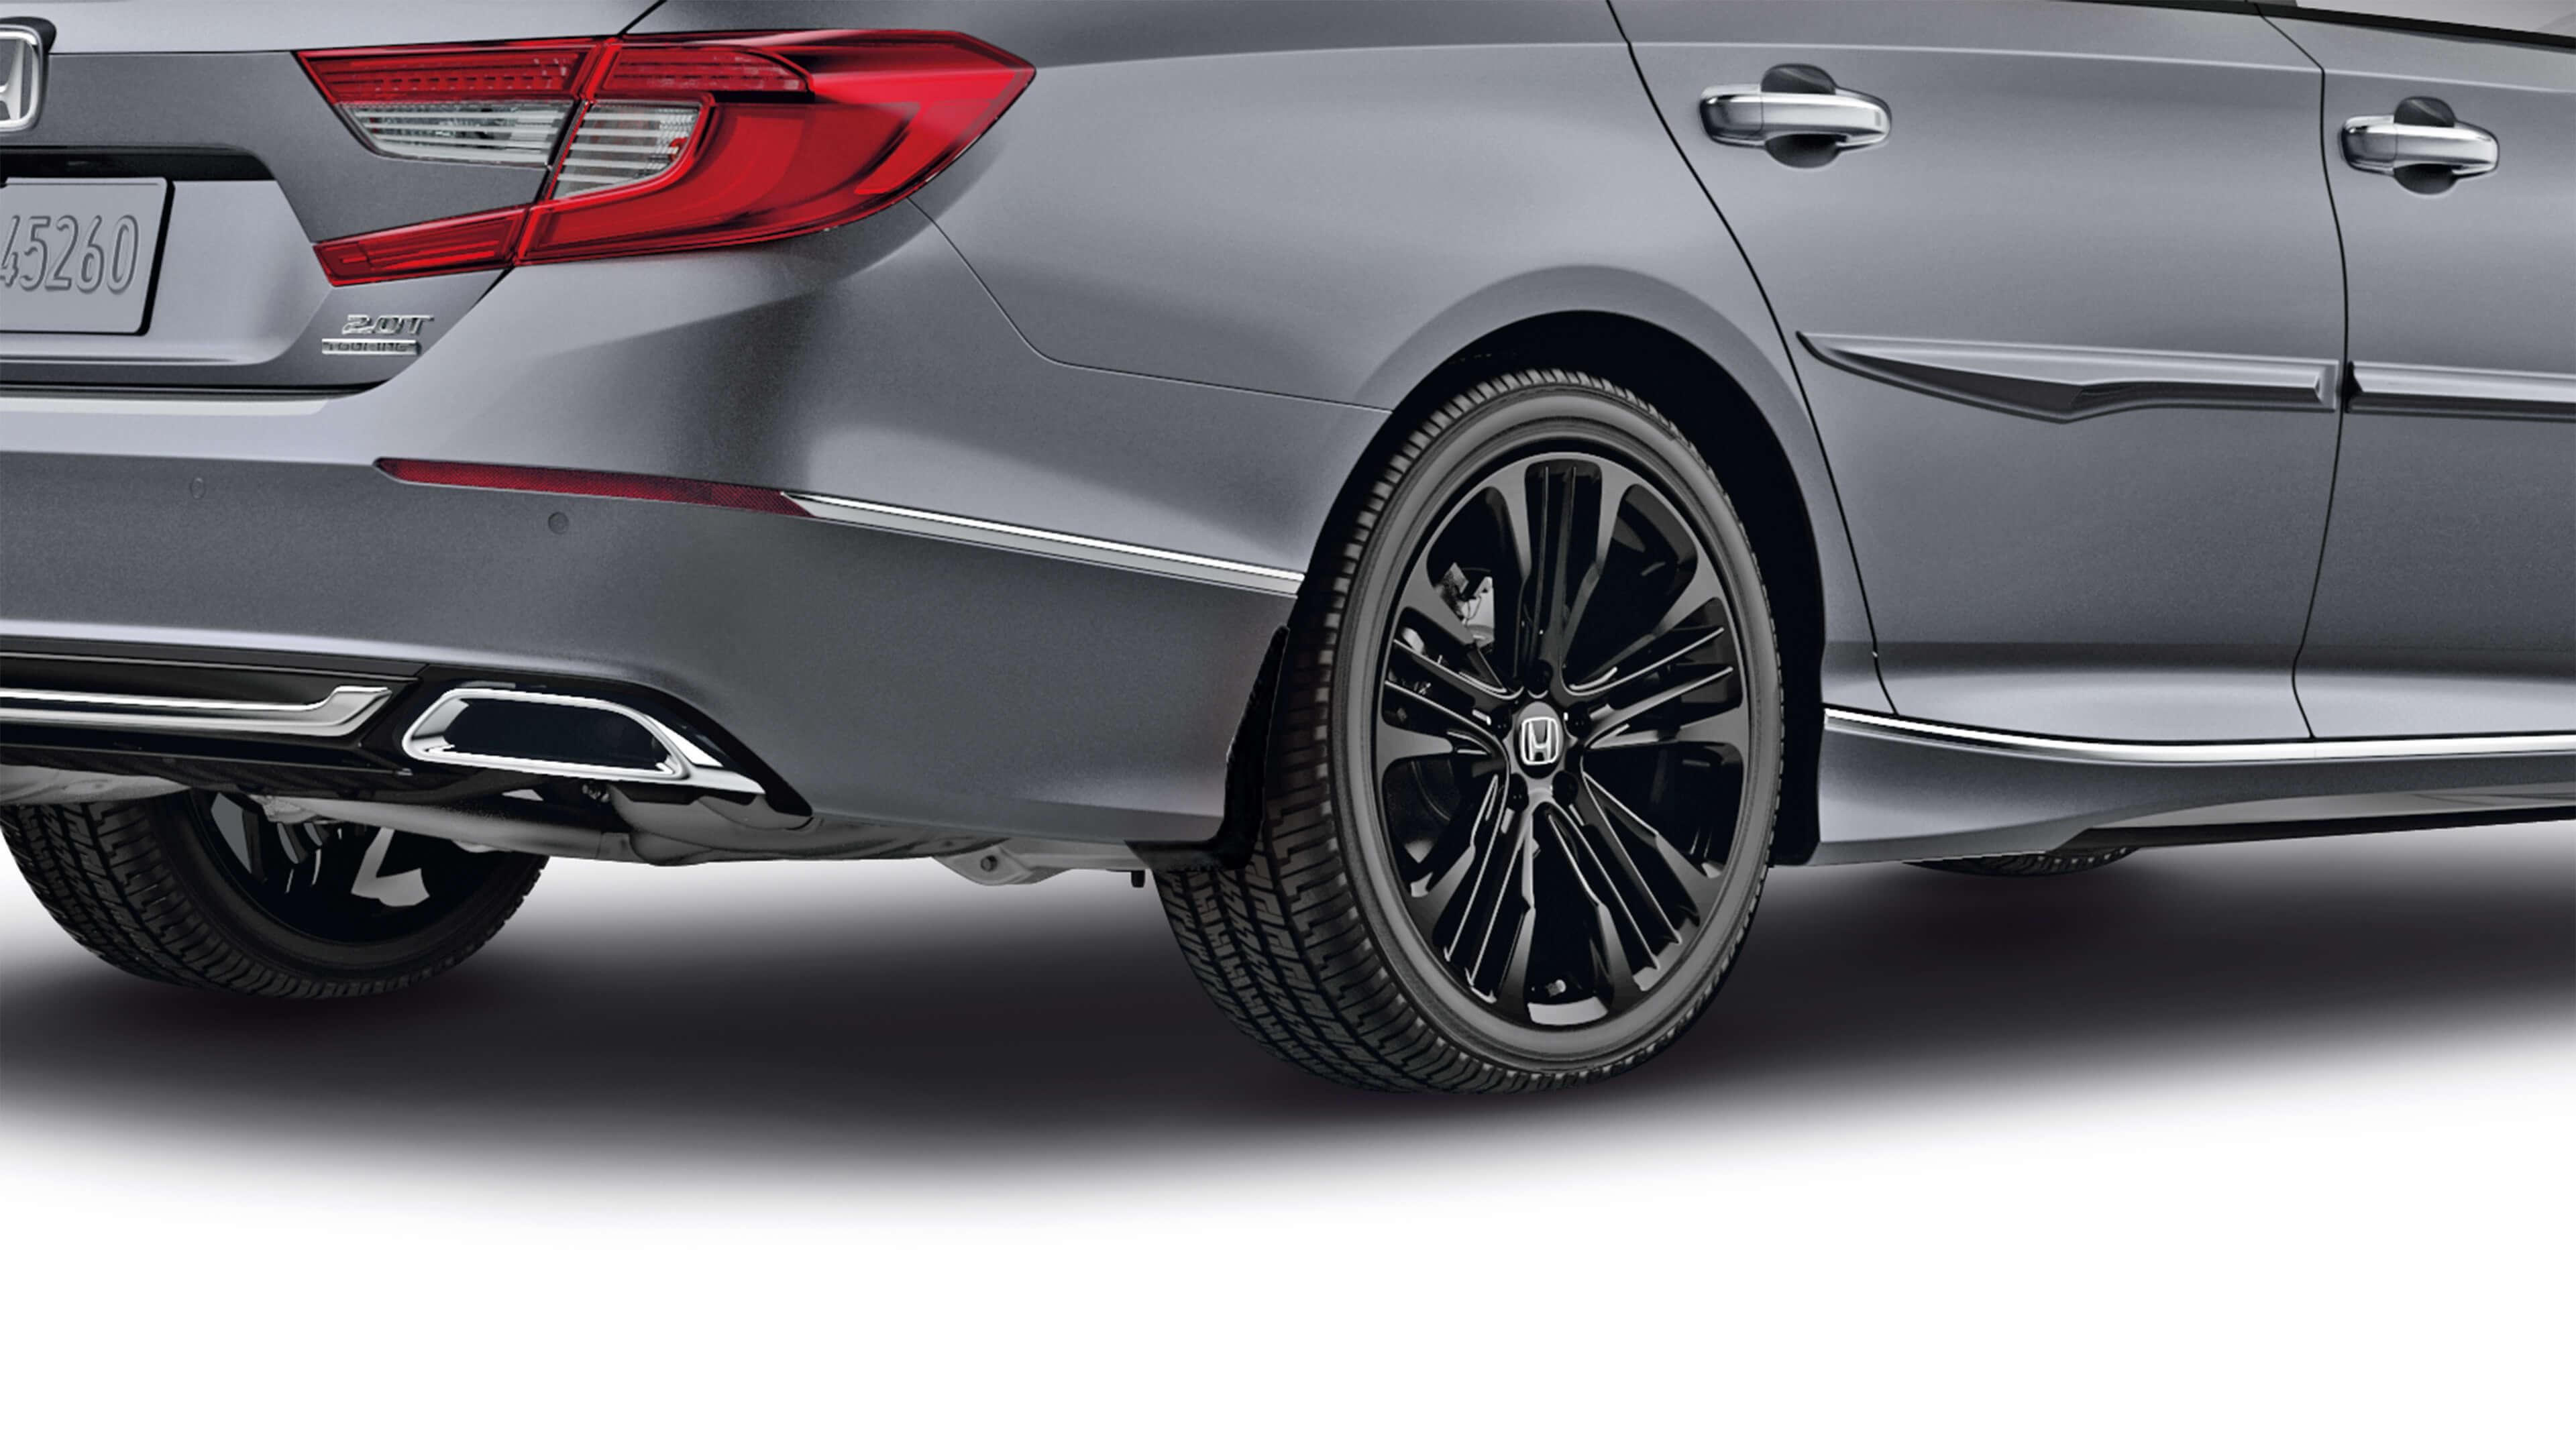 Accessories 2019 Accord Sedan Honda Canada Tires Rear Splash Guard